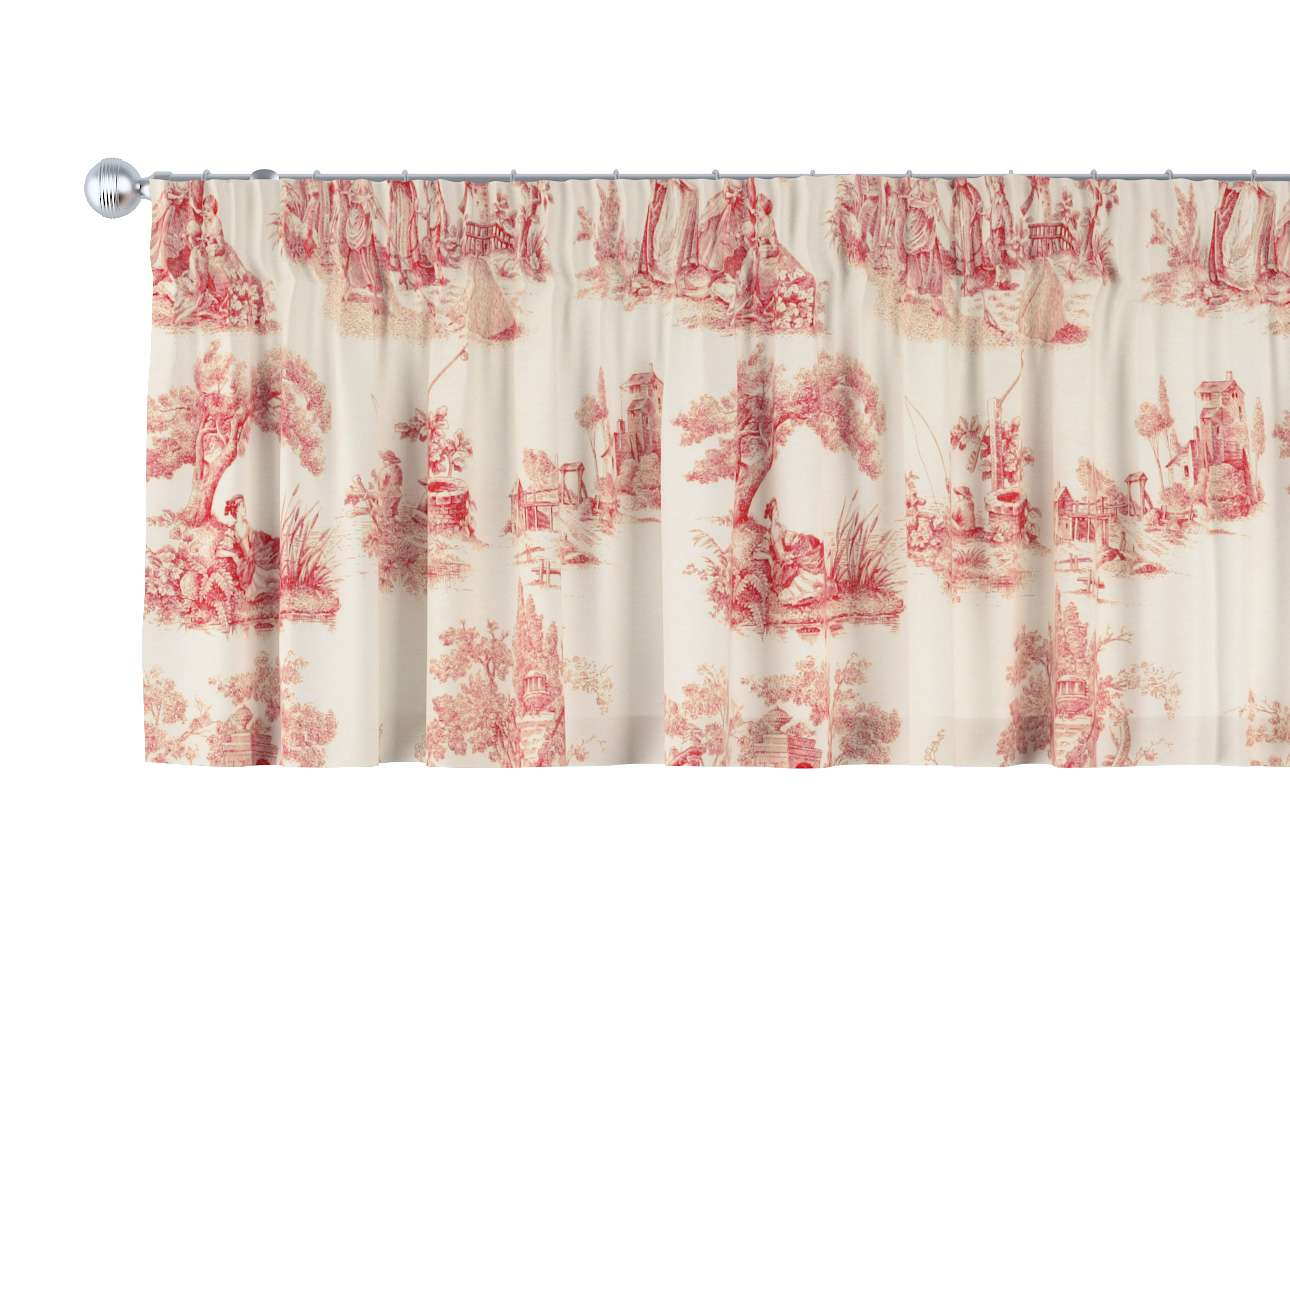 Pencil pleat pelmet 130 x 40 cm (51 x 16 inch) in collection Avinon, fabric: 132-15